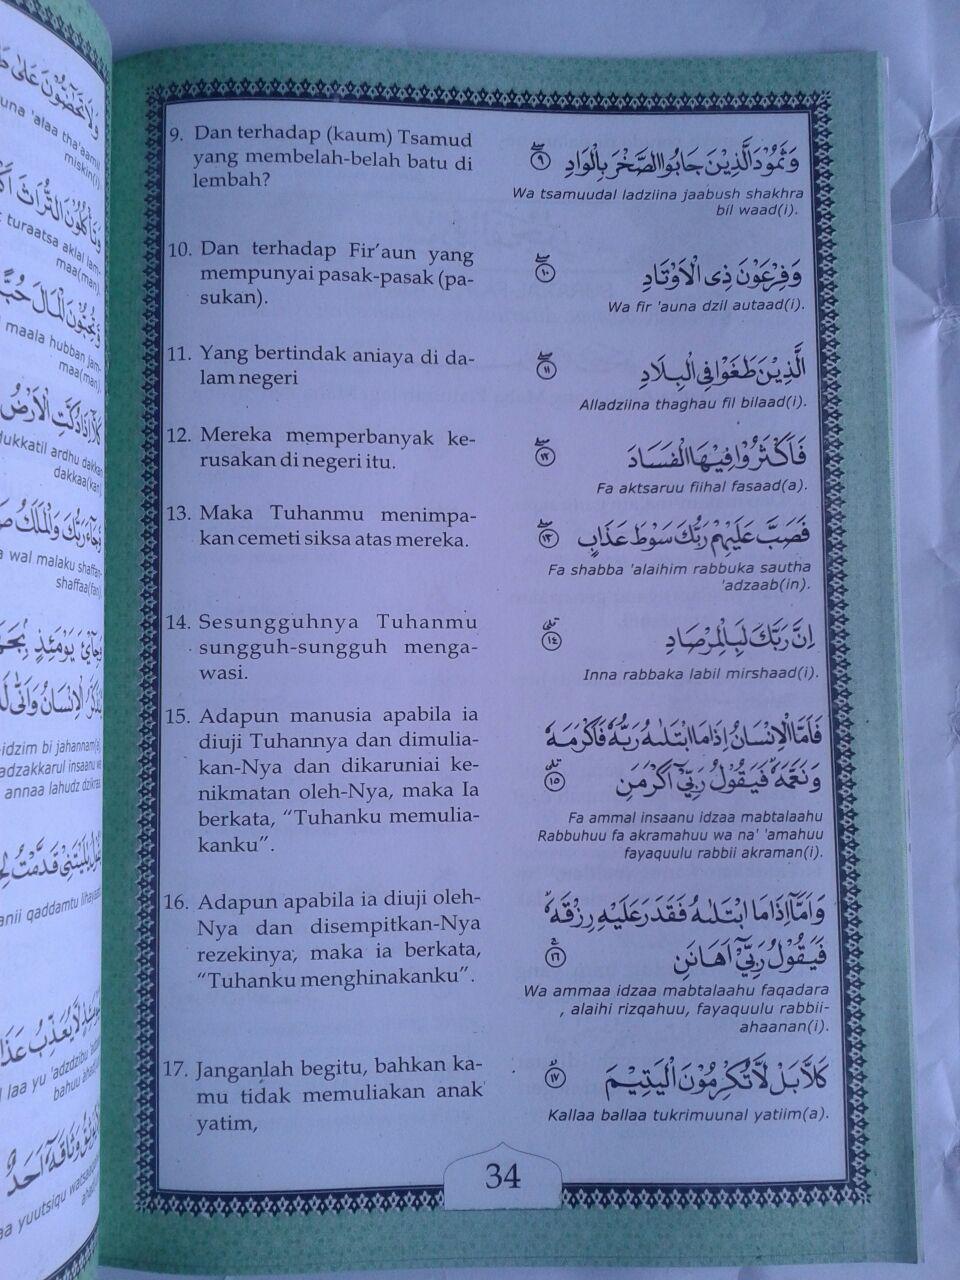 Buku Terjemah Juz Amma Disertai Lafal Transliterasi Ukuran A4 isi